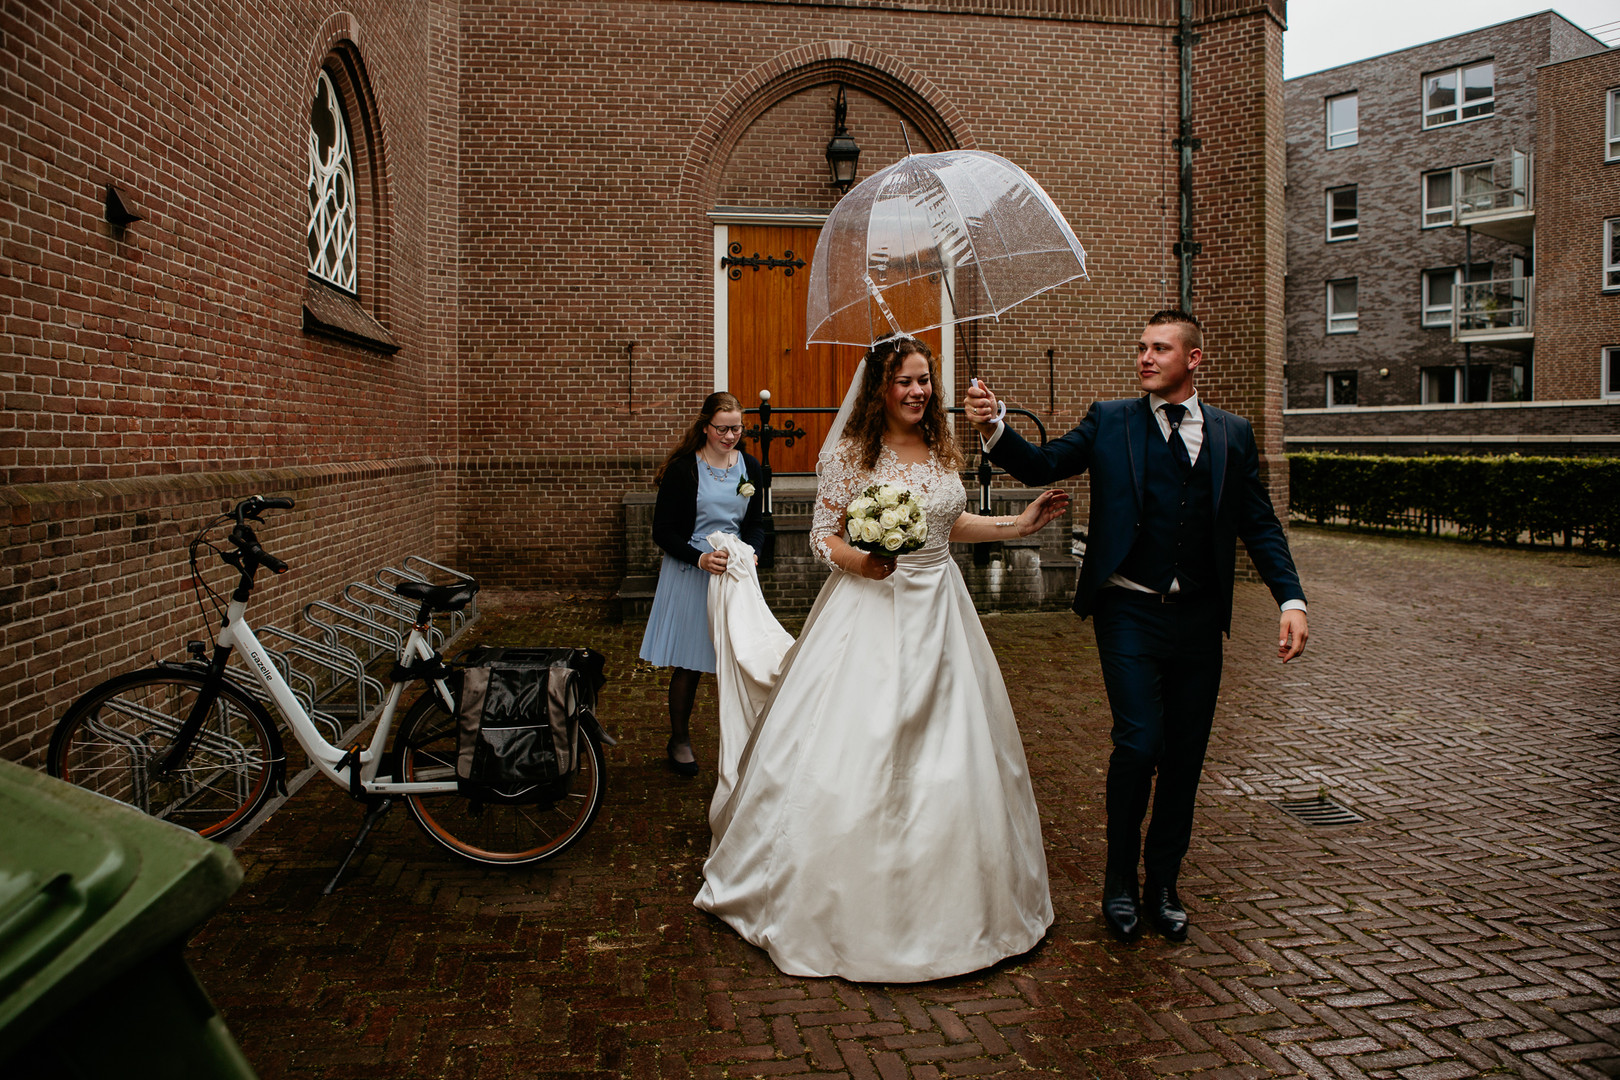 Bruiloft Alblasserdam